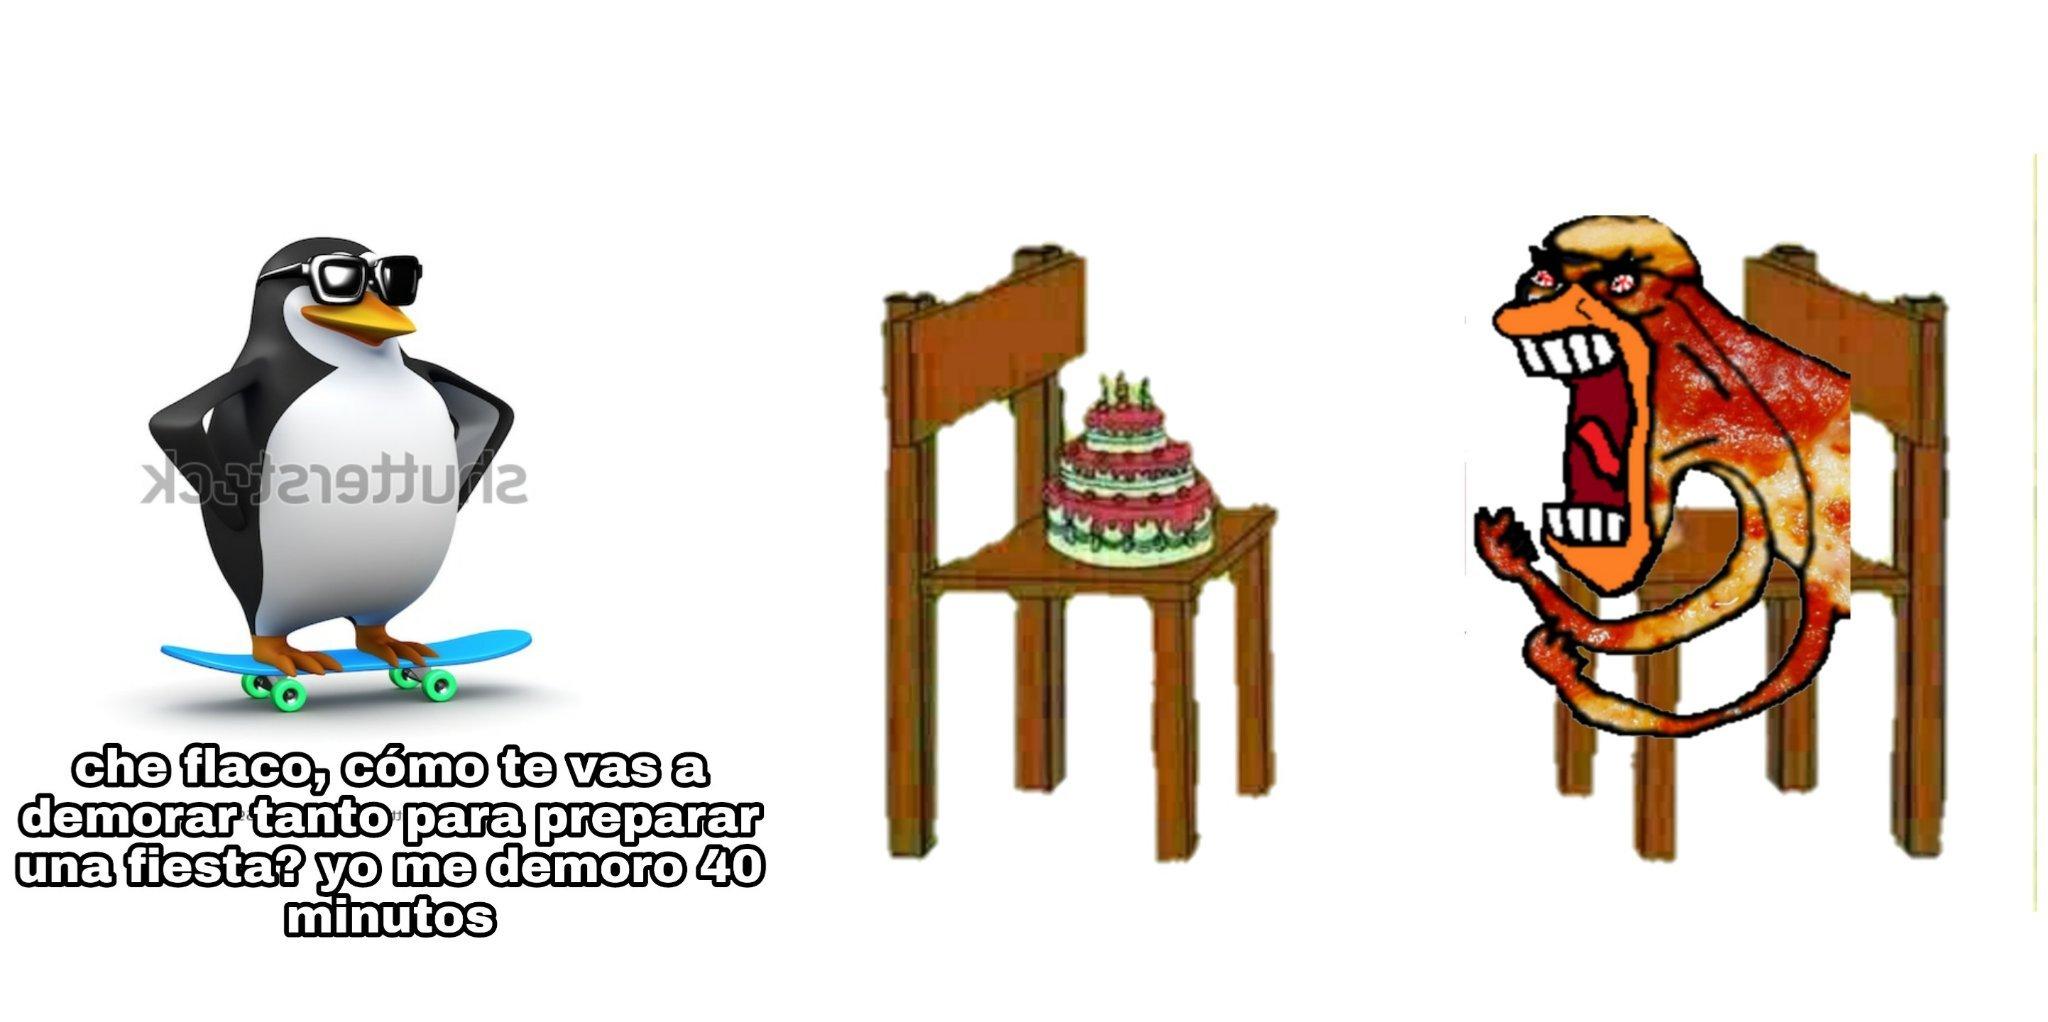 TOMAS SEMEN ARGENTINO - meme